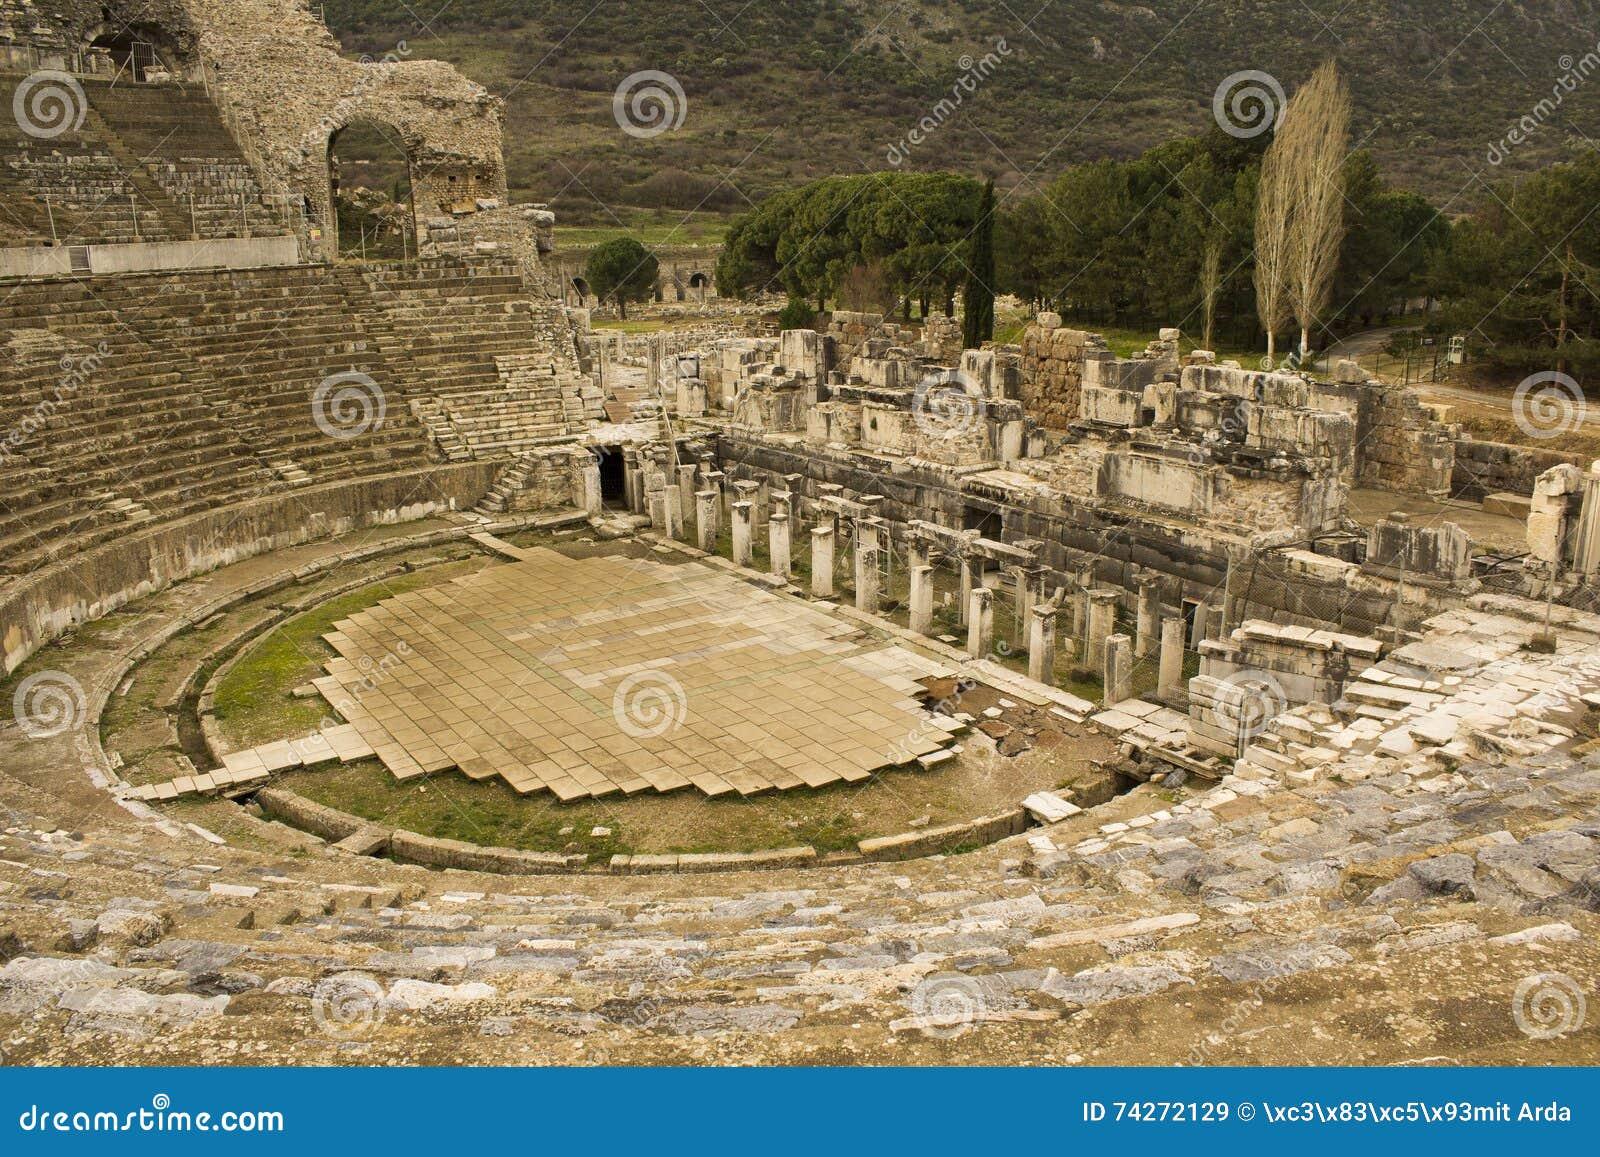 Gladiator Arena Stock Image Image Of Rome Combat Empire 74272129